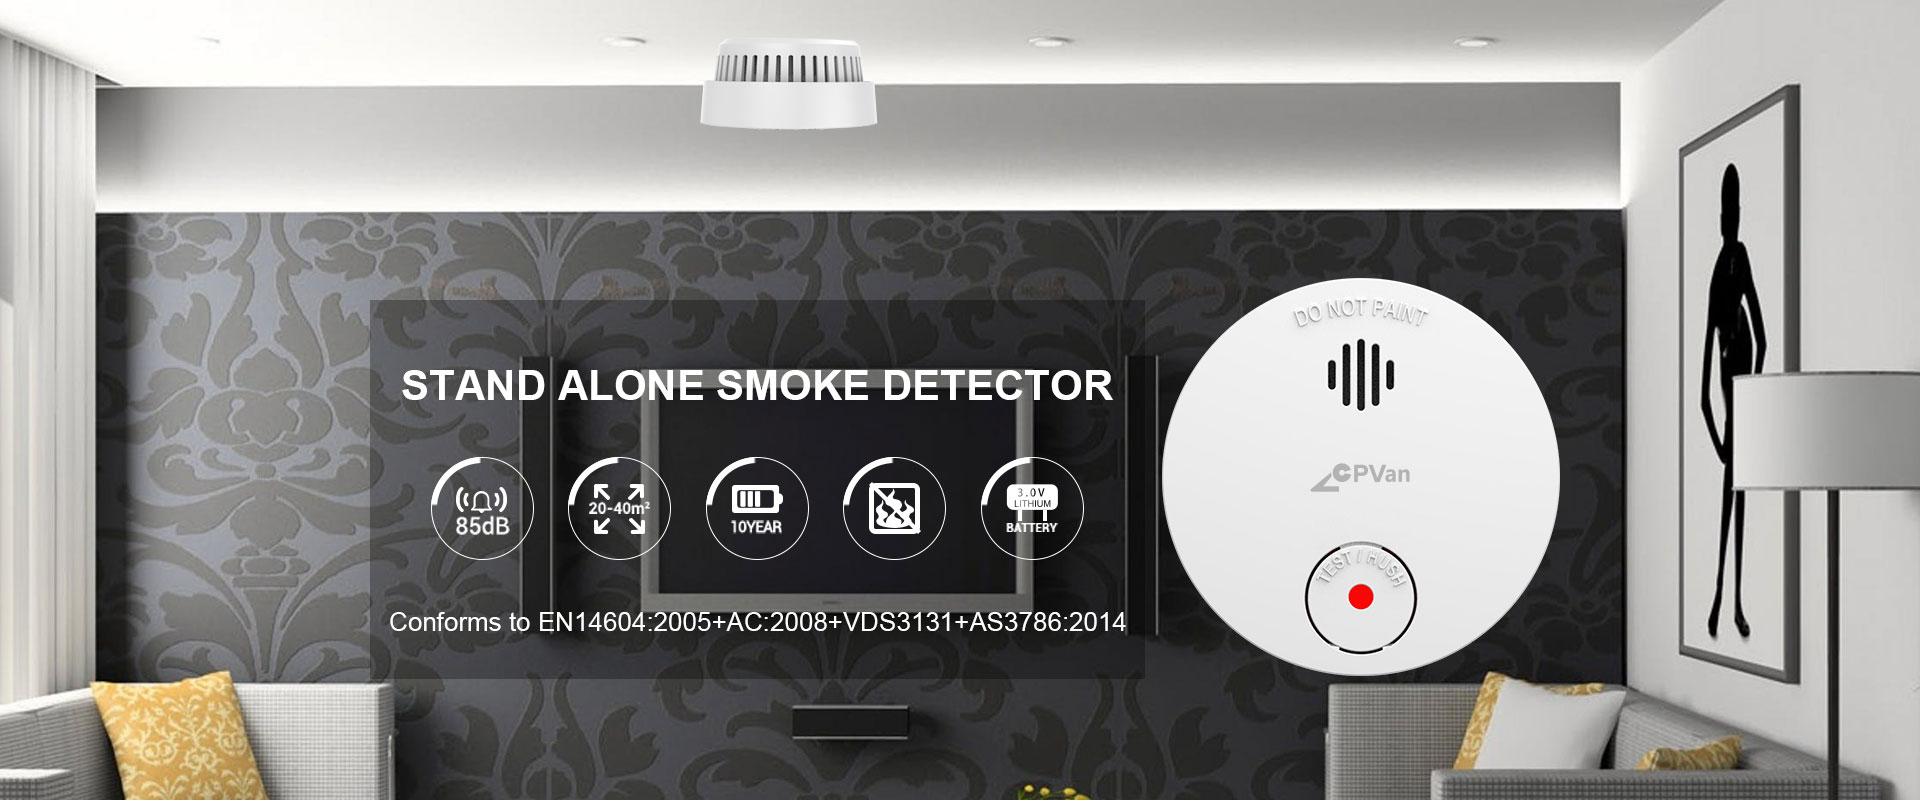 Medium Smoke Detector (M series)